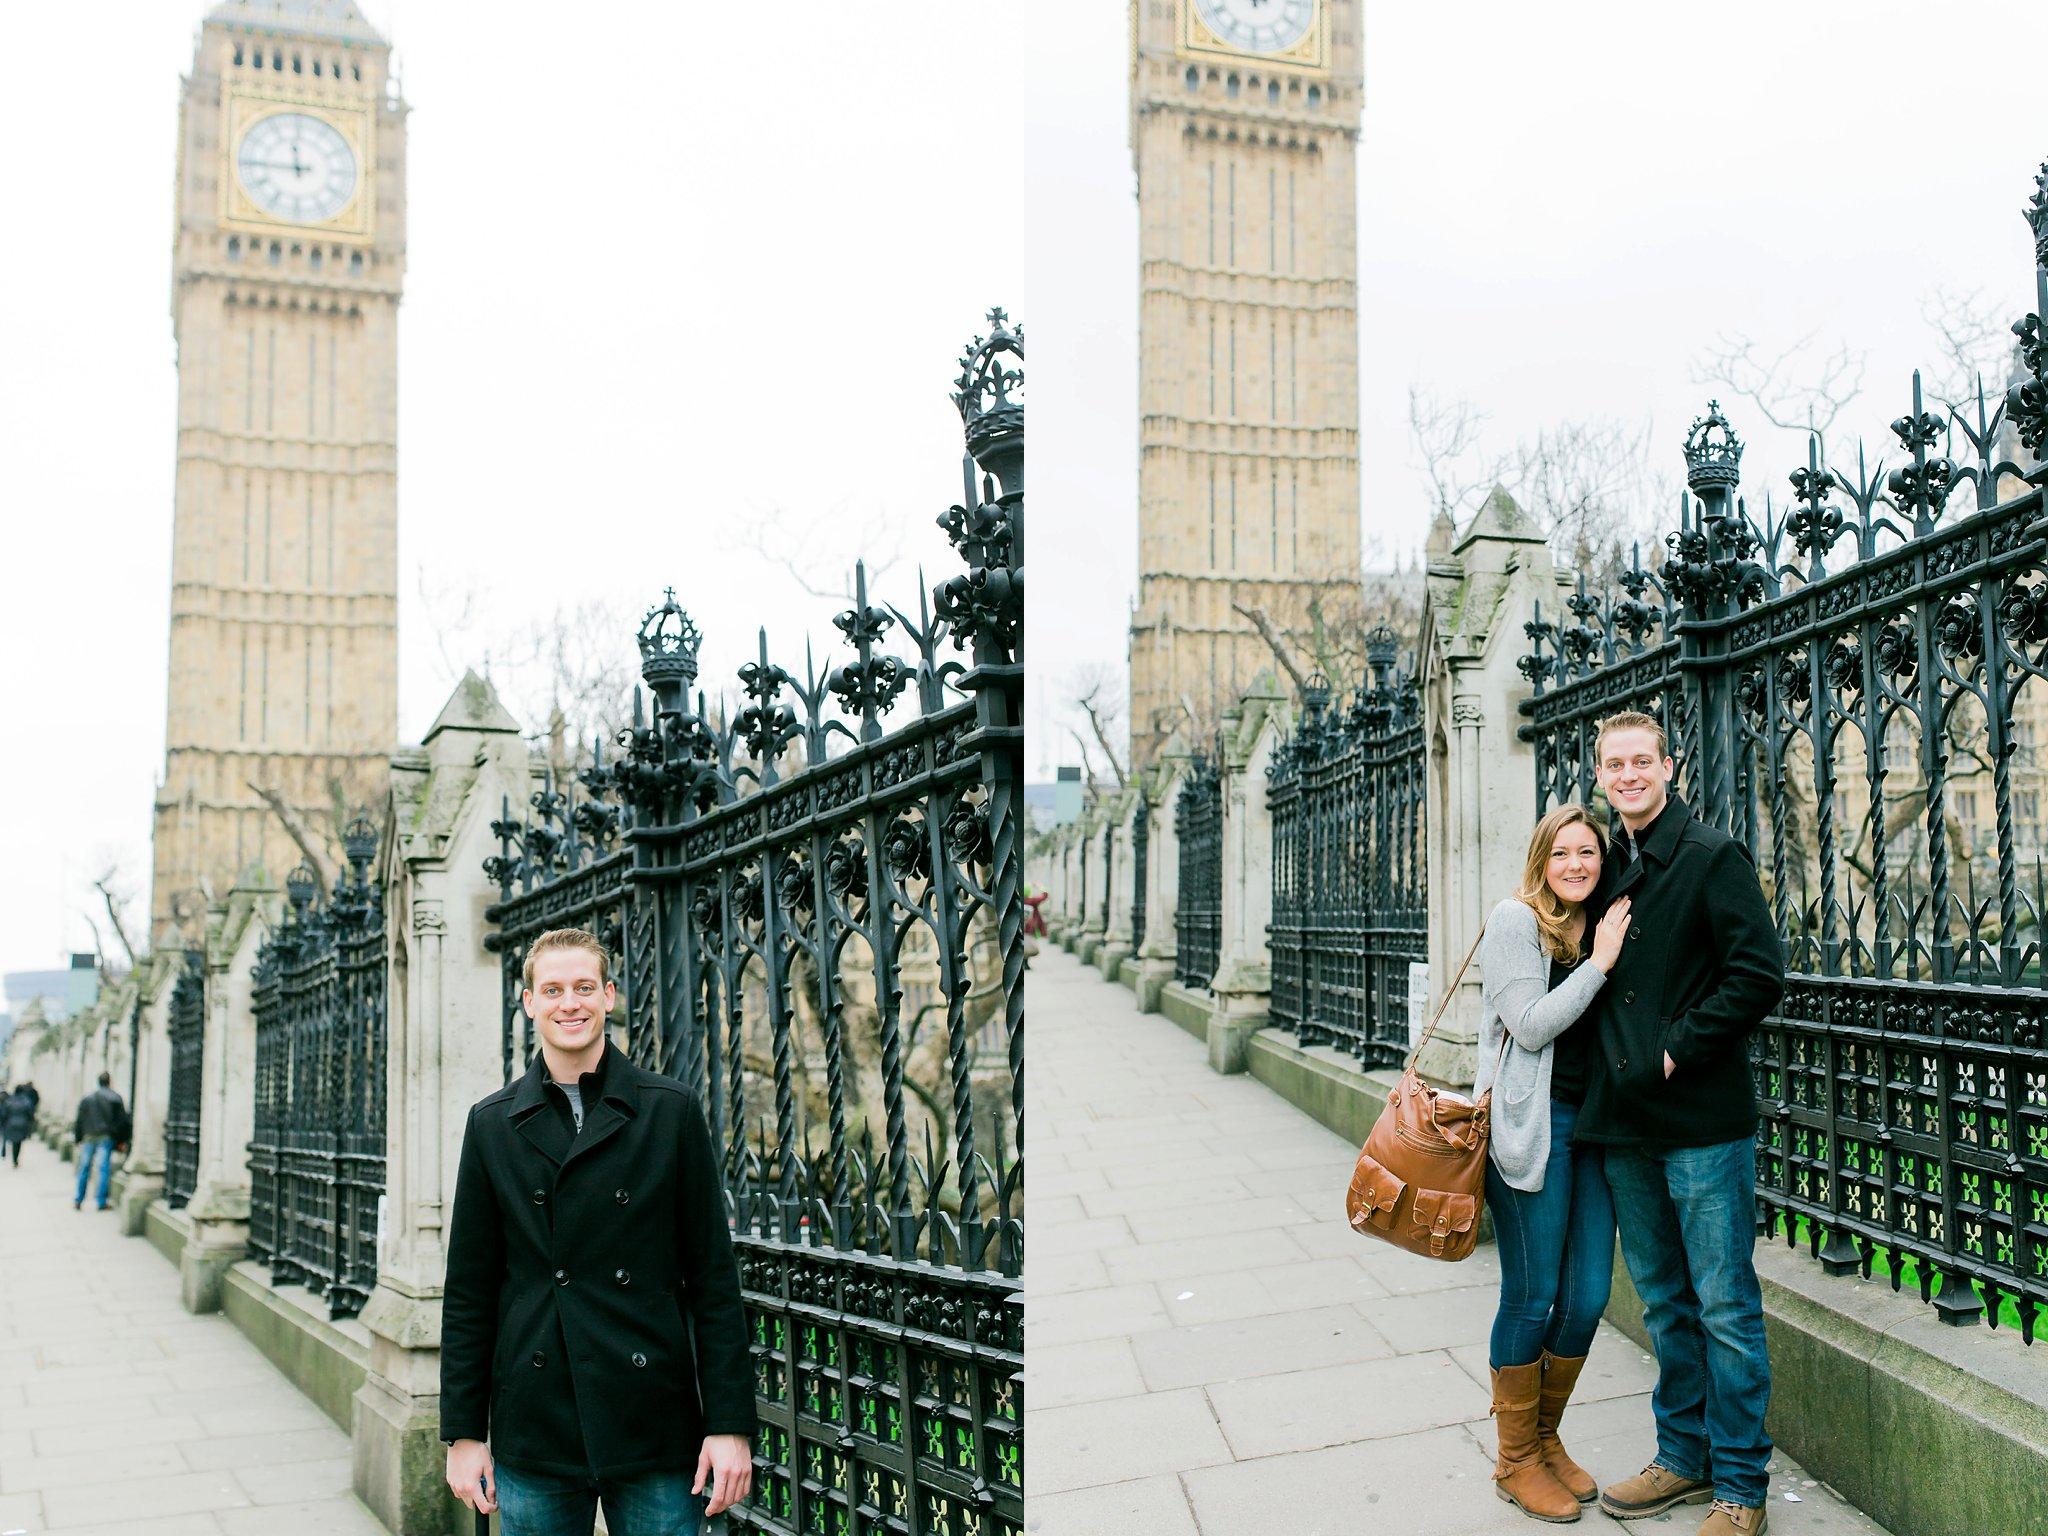 London Part II Westminster Abbey Tower Bridge Tower of London Big Ben-1791.jpg